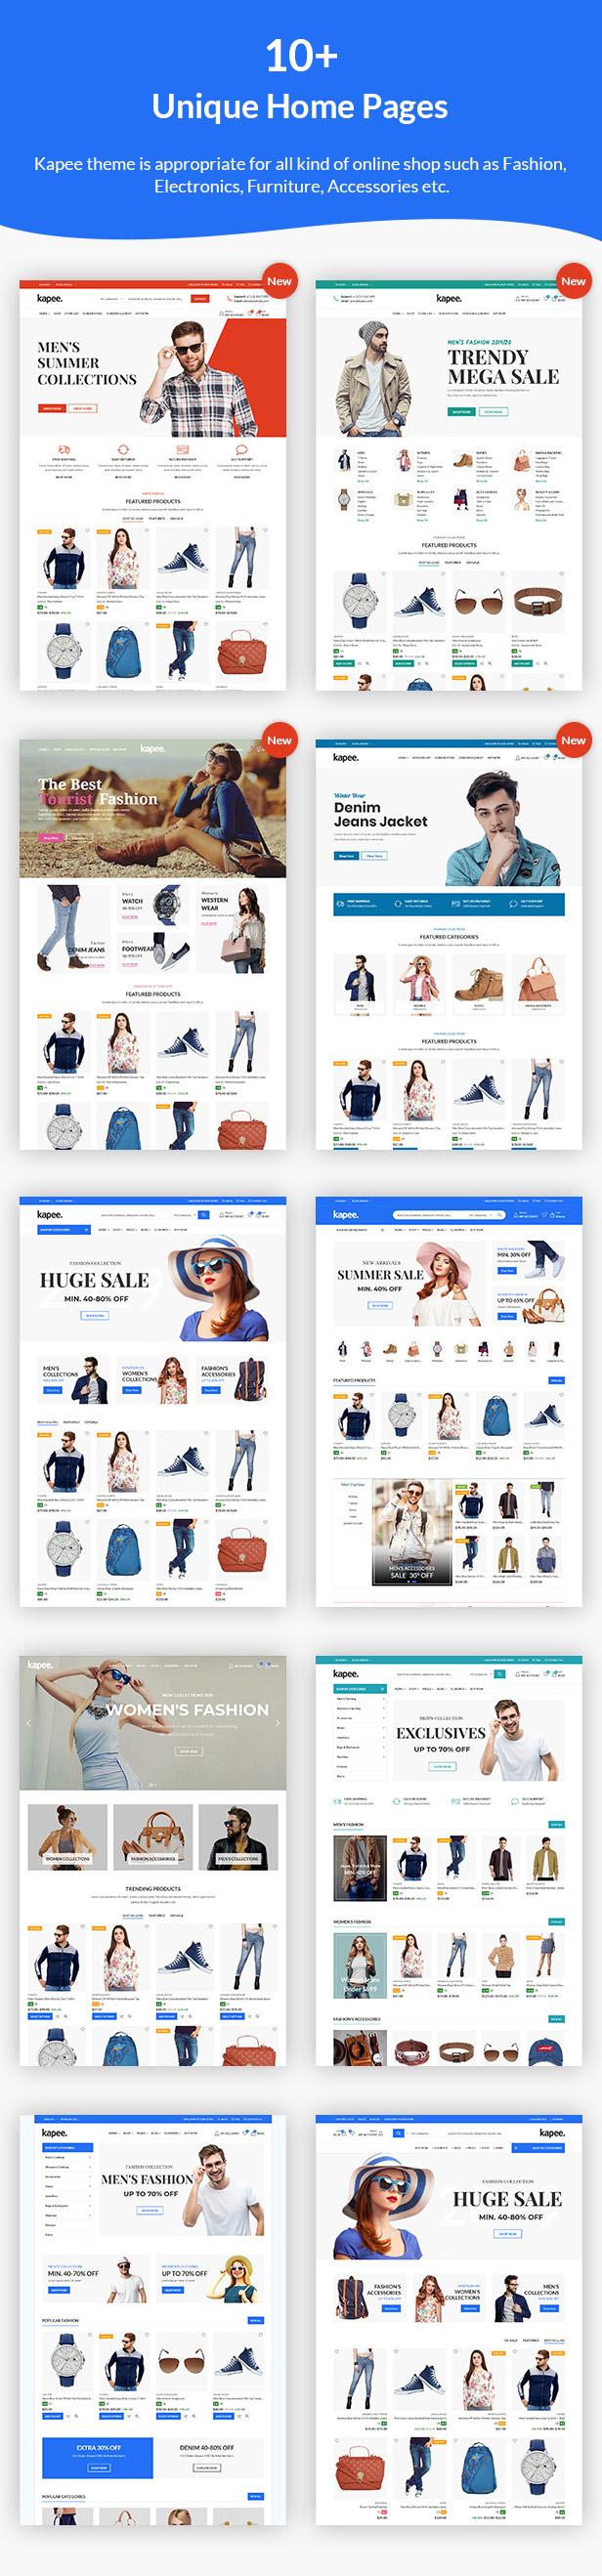 Kapee - Fashion Store WooCommerce Theme 2